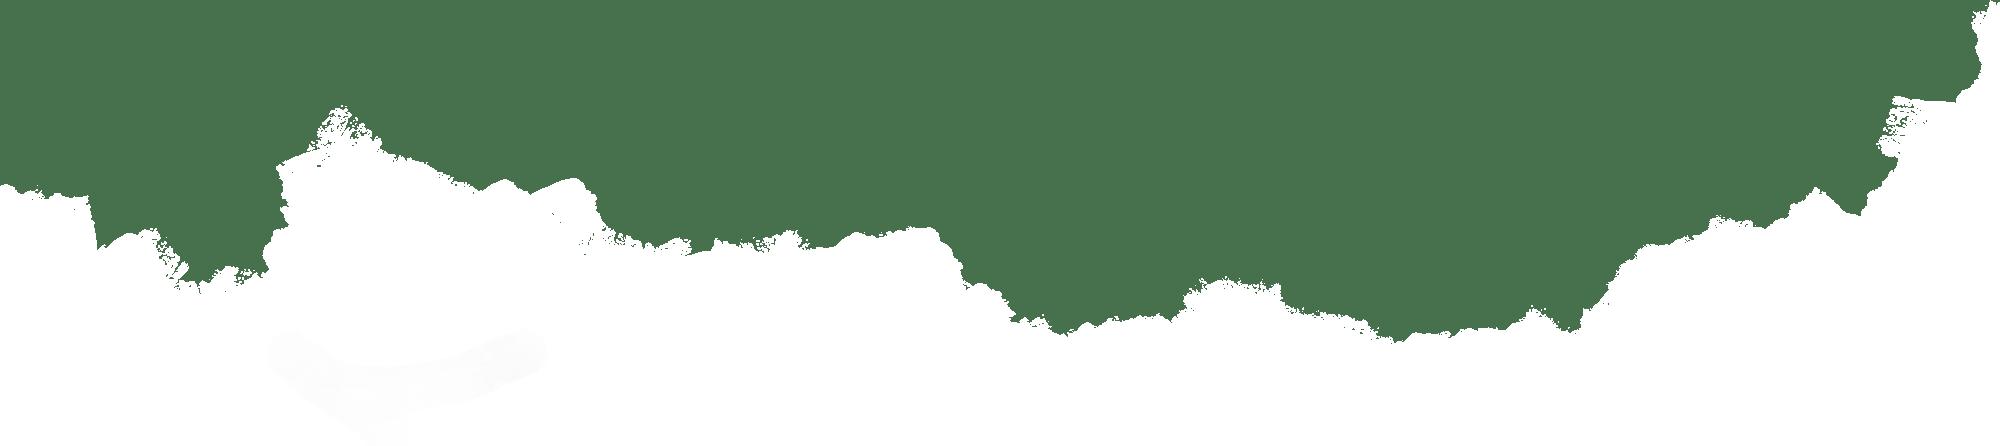 fondo semitransparente postdata ediciones editorial prosa poética